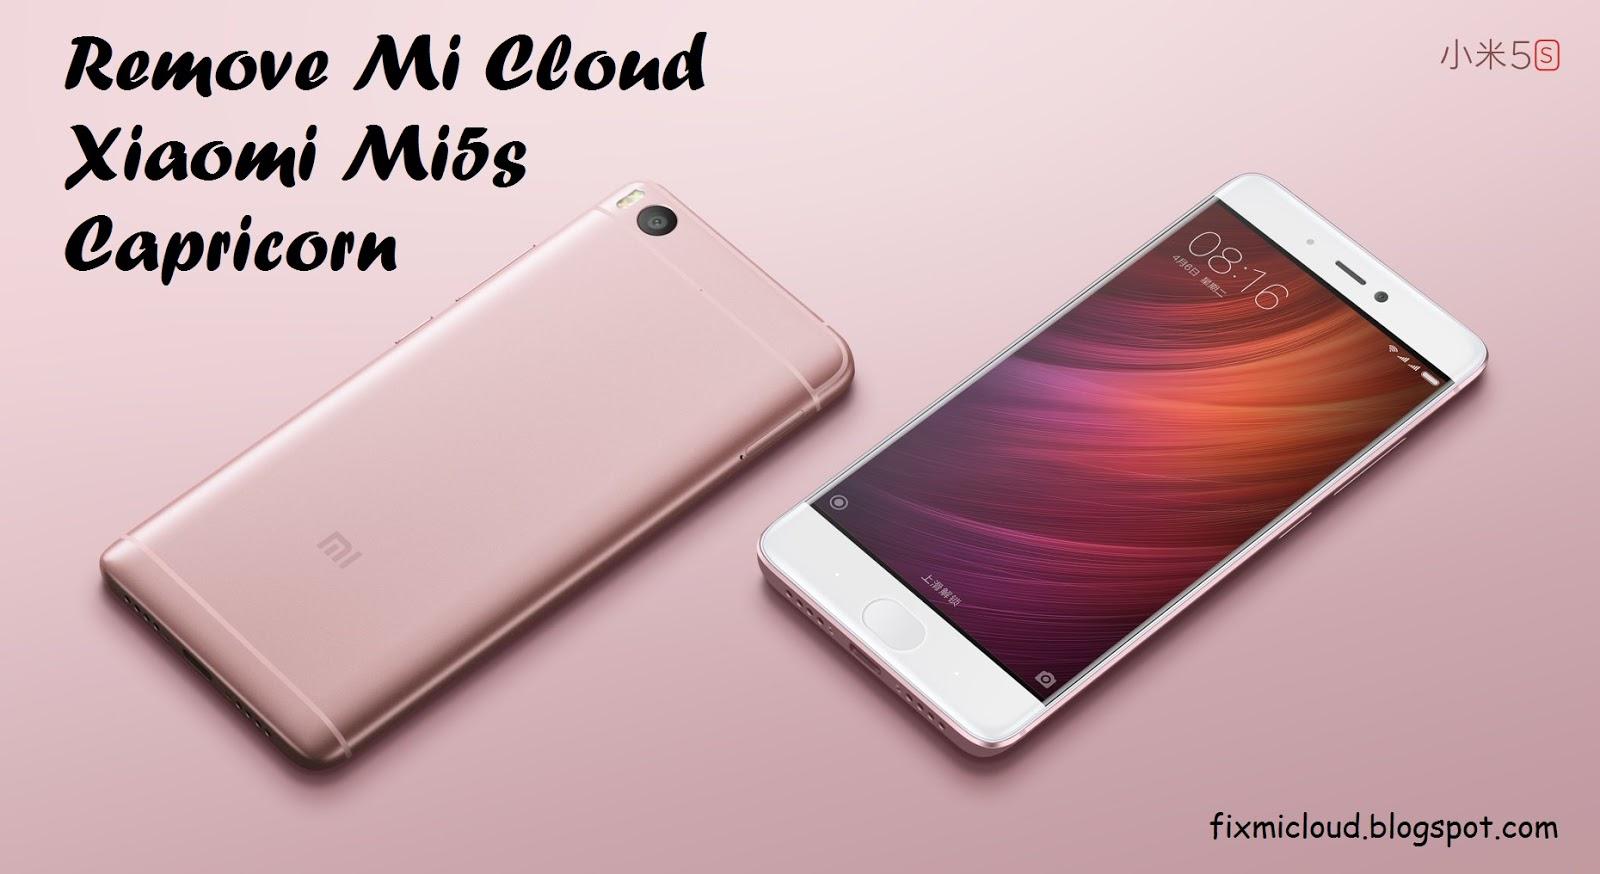 Cara Mengatasi Lupa Akun Mi Cloud Xiaomi Mi 5s Capricorn